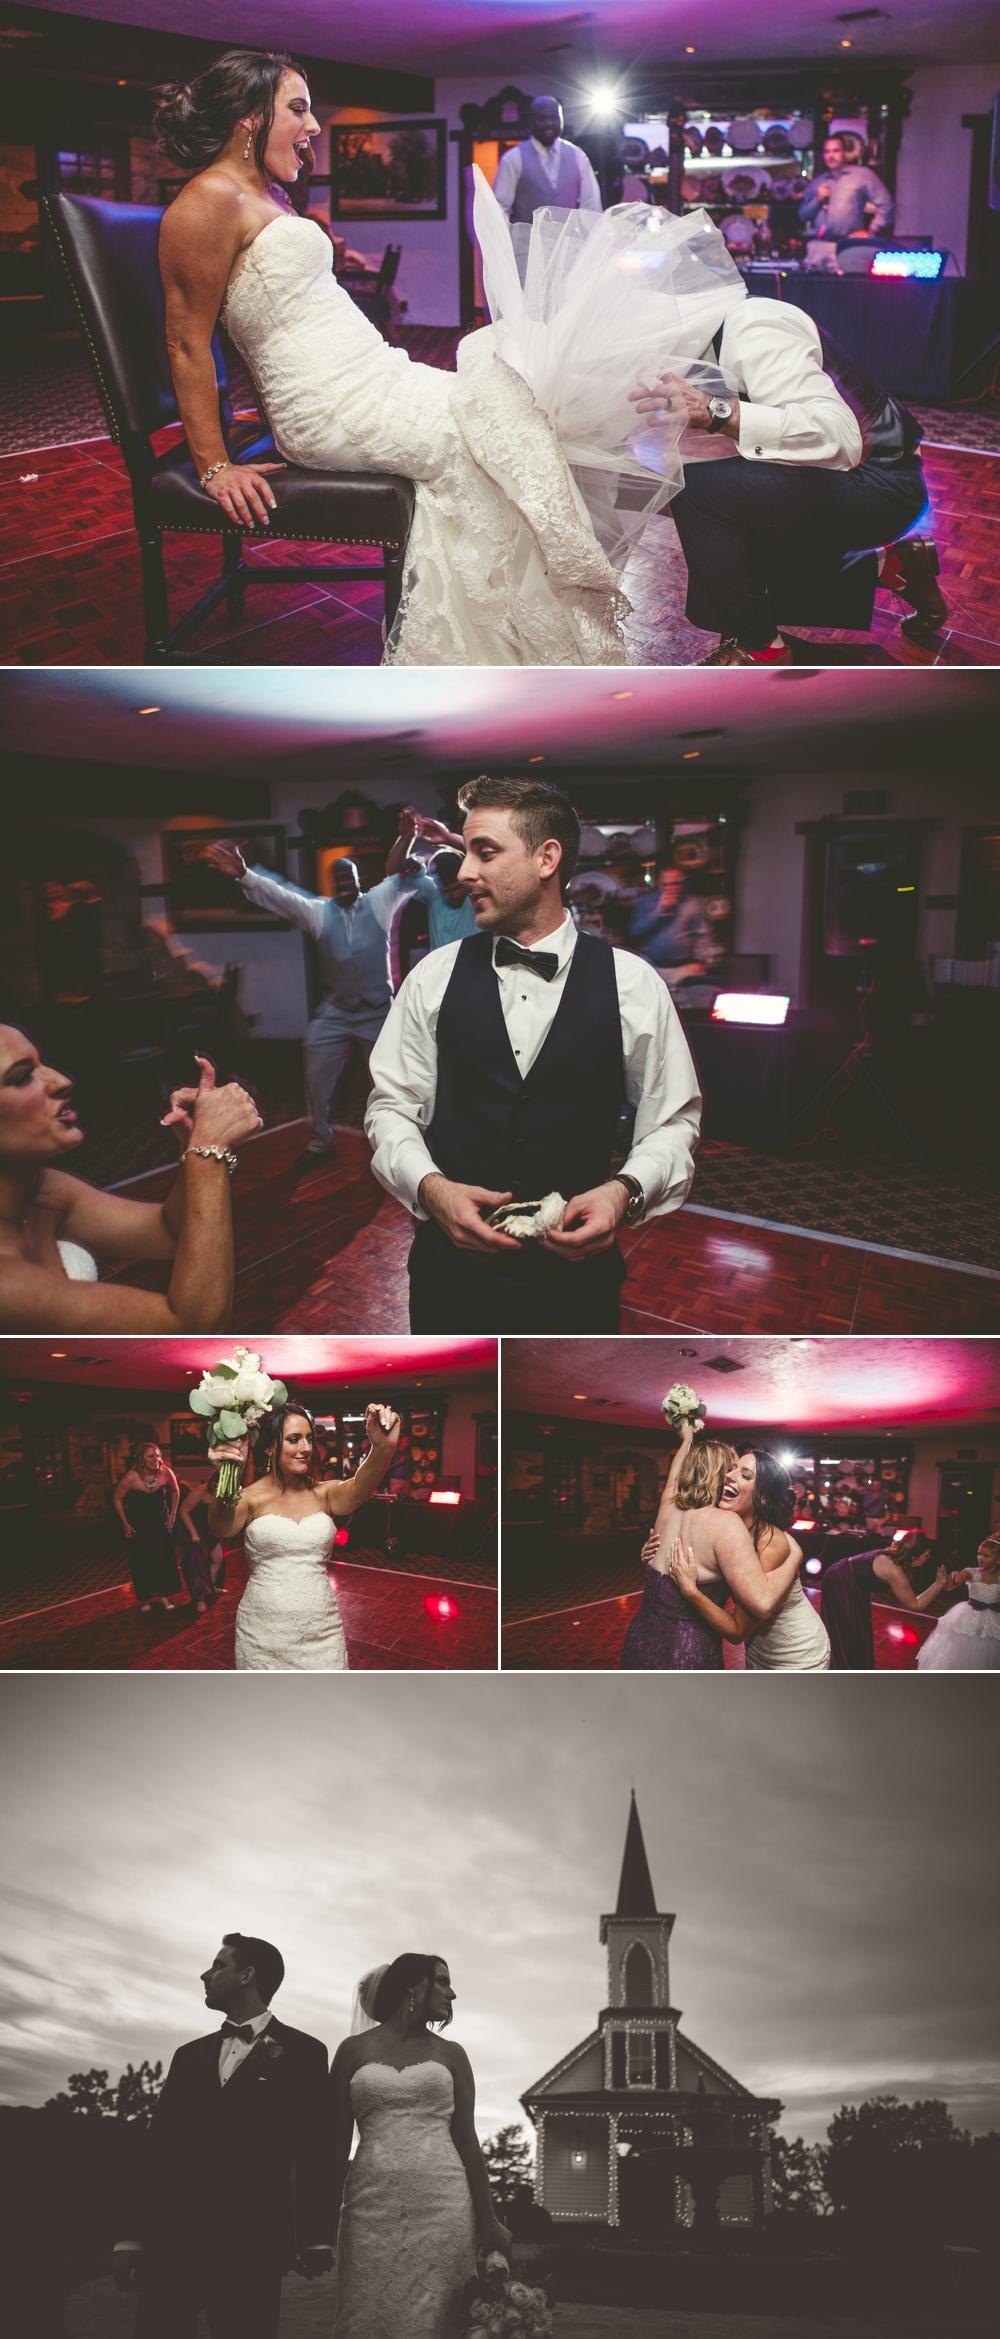 jason_domingues_photography_-best_kansas_city_photographer_big_cedar_lodge_wedding_ozark_kc_missouri_0005